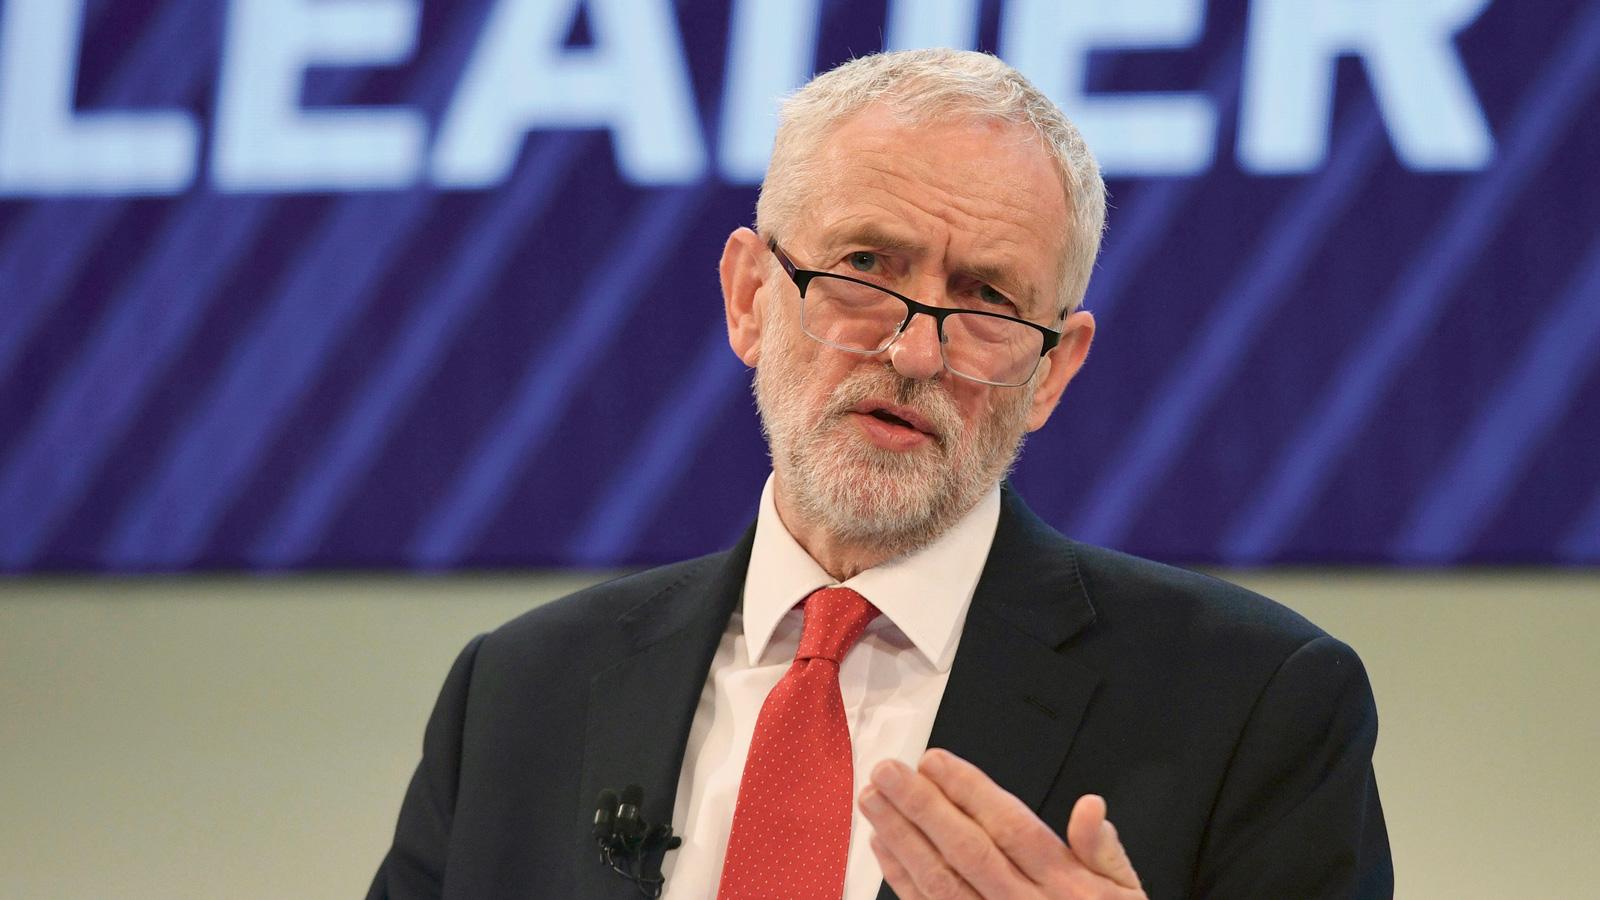 Brittisk socialdemokrati vid vagval